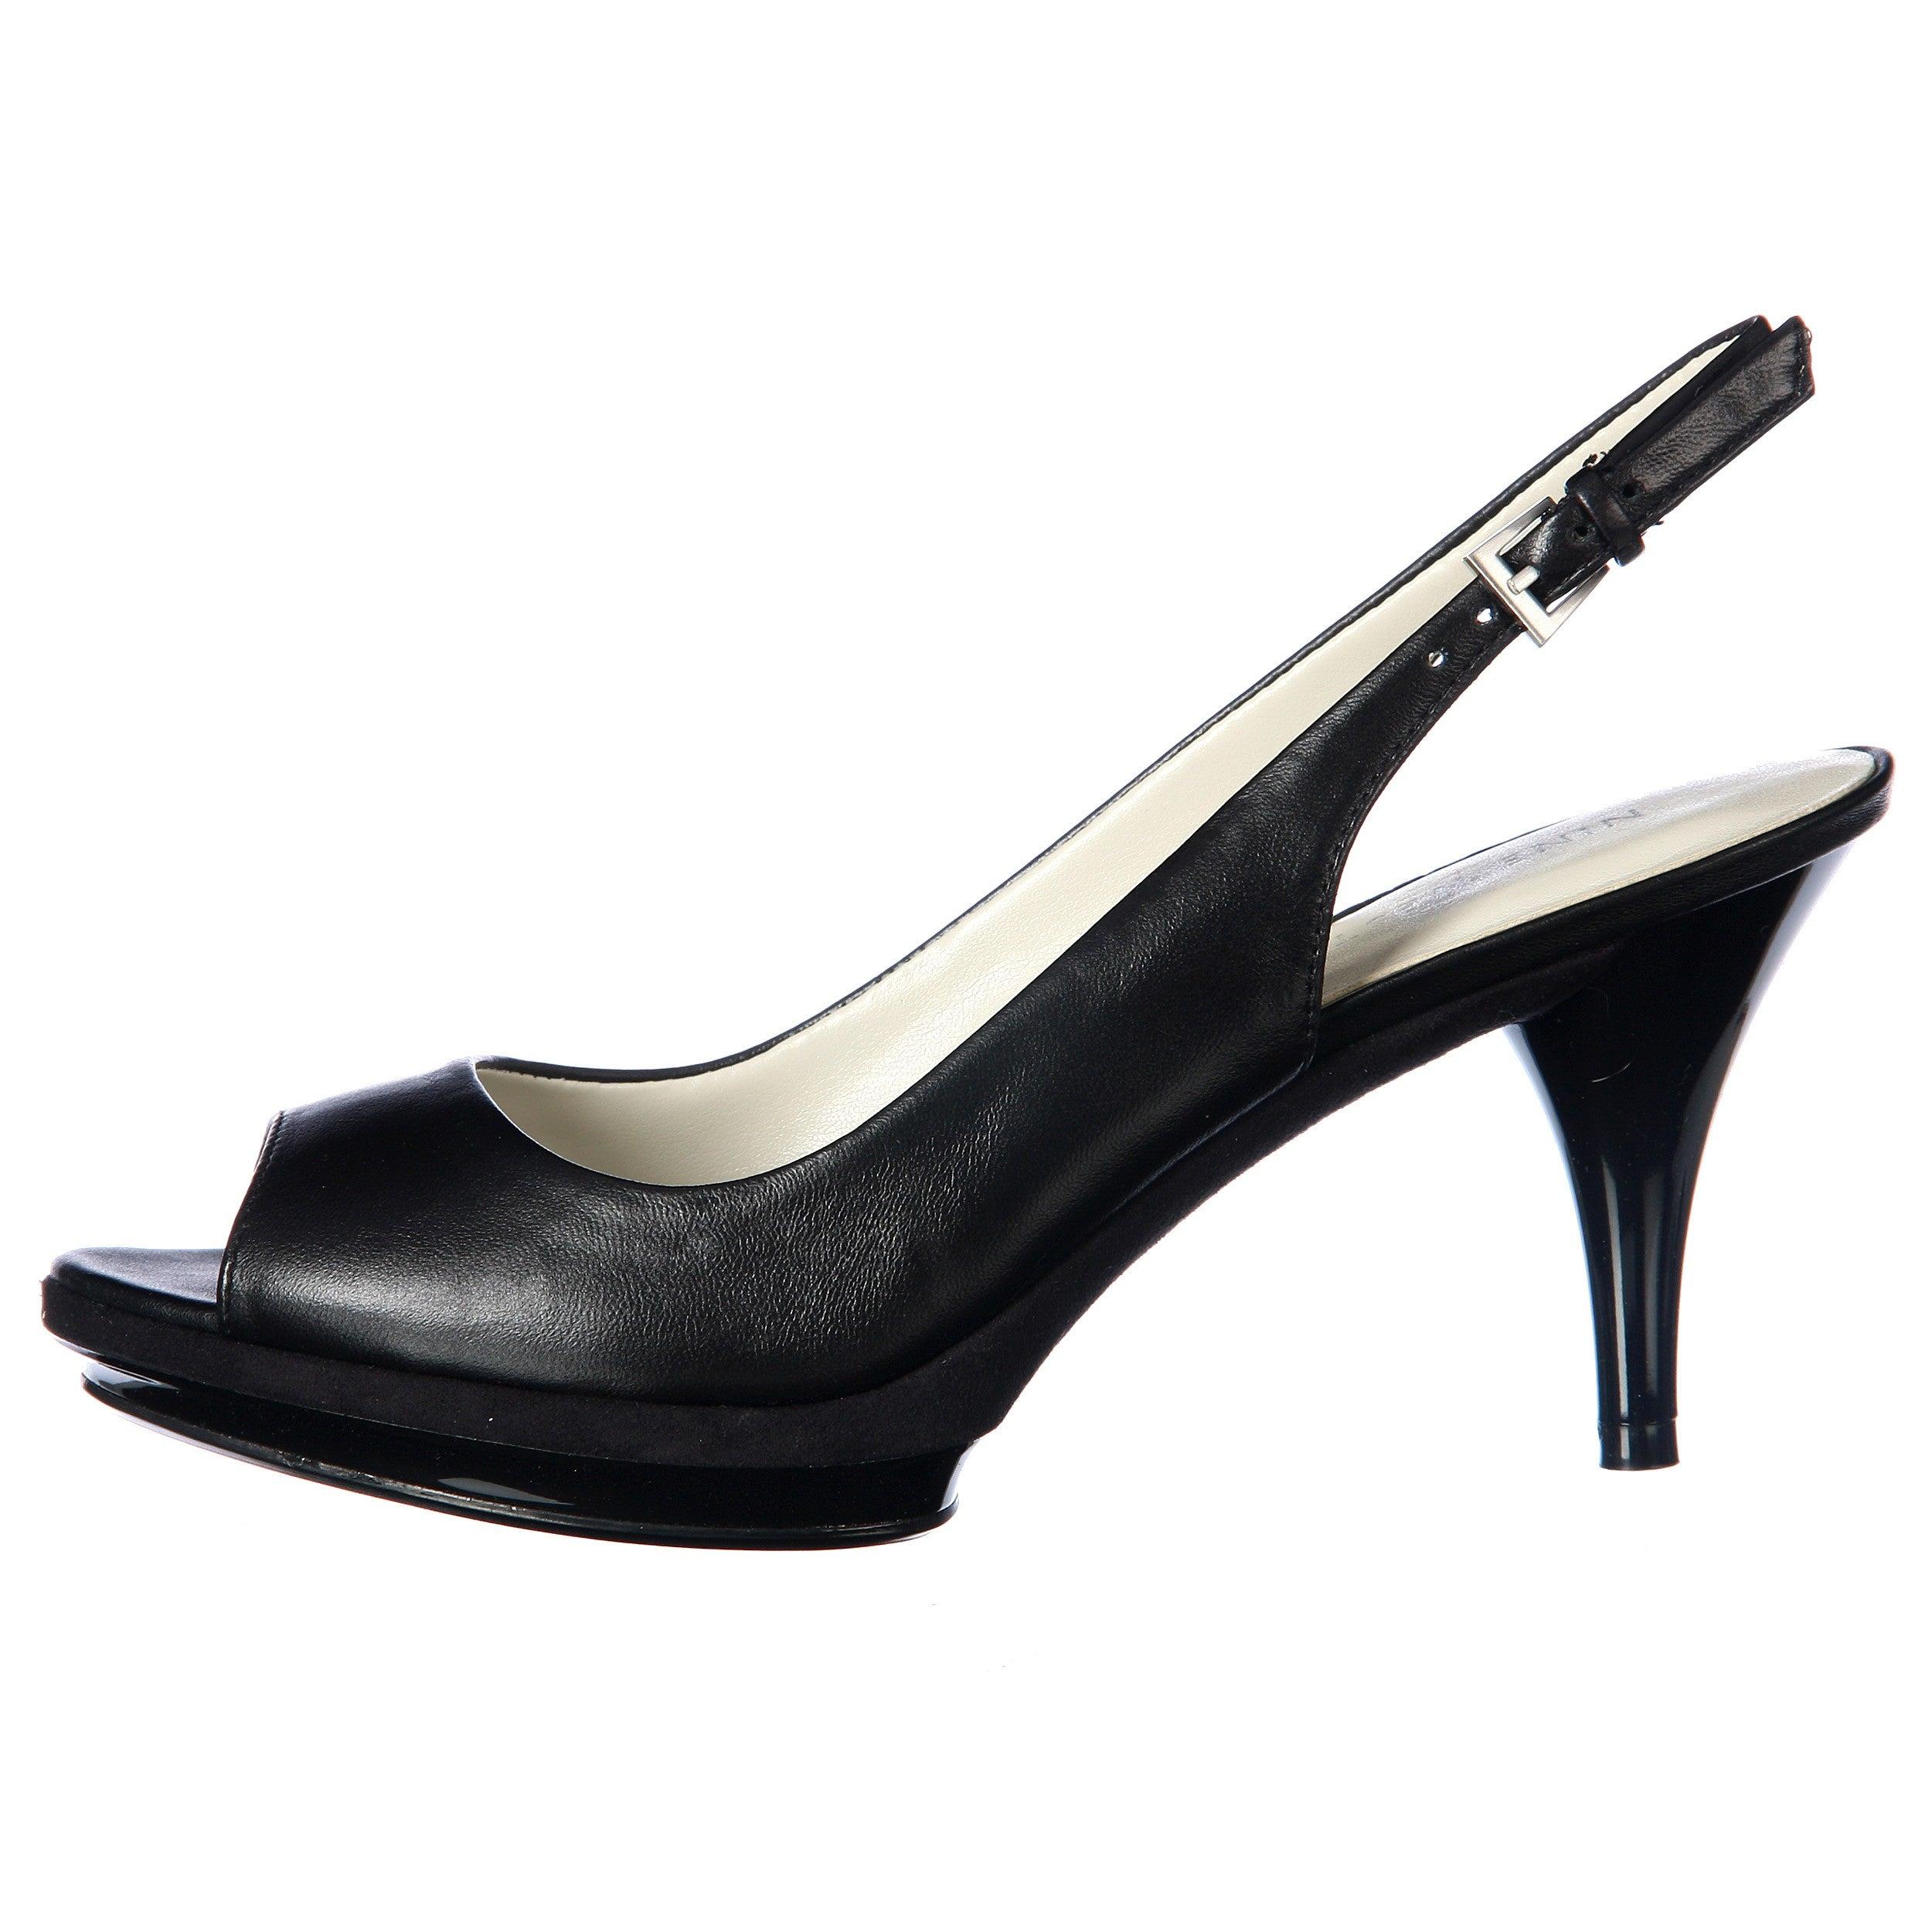 7bbefb891e3 Shop Nine West Women s  Sharina  Black Slingback Pumps - Free Shipping  Today - Overstock - 5822384